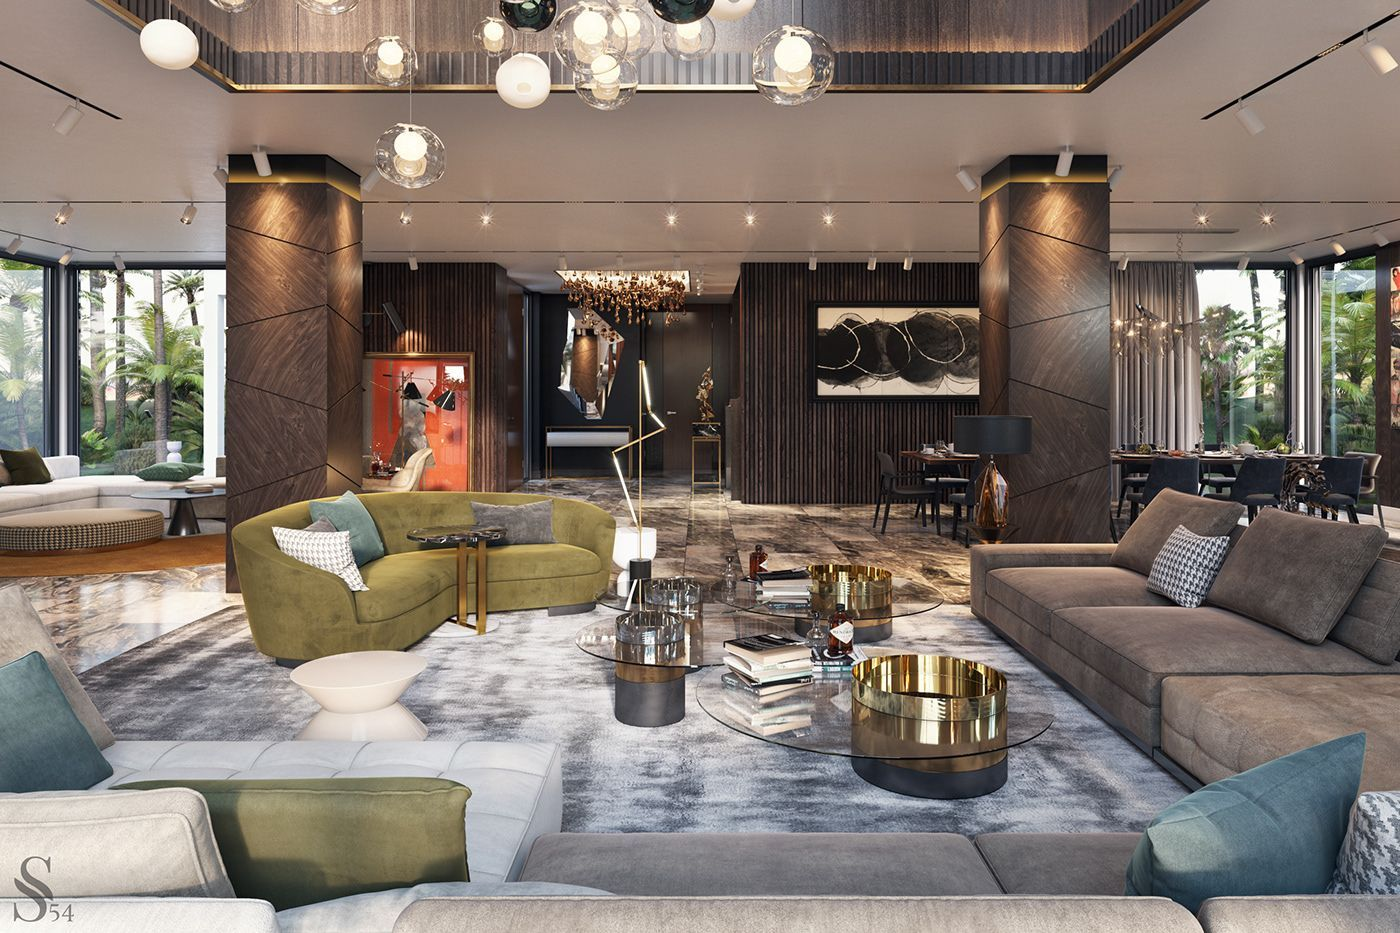 Luxury Design Interior Luxury Design Bedding Luxury Design Homes Interiors Luxury Design Bedroom Luxury Design Bedroom 2020 Ic Tasarim Daire Ic Tasarim Tasarim